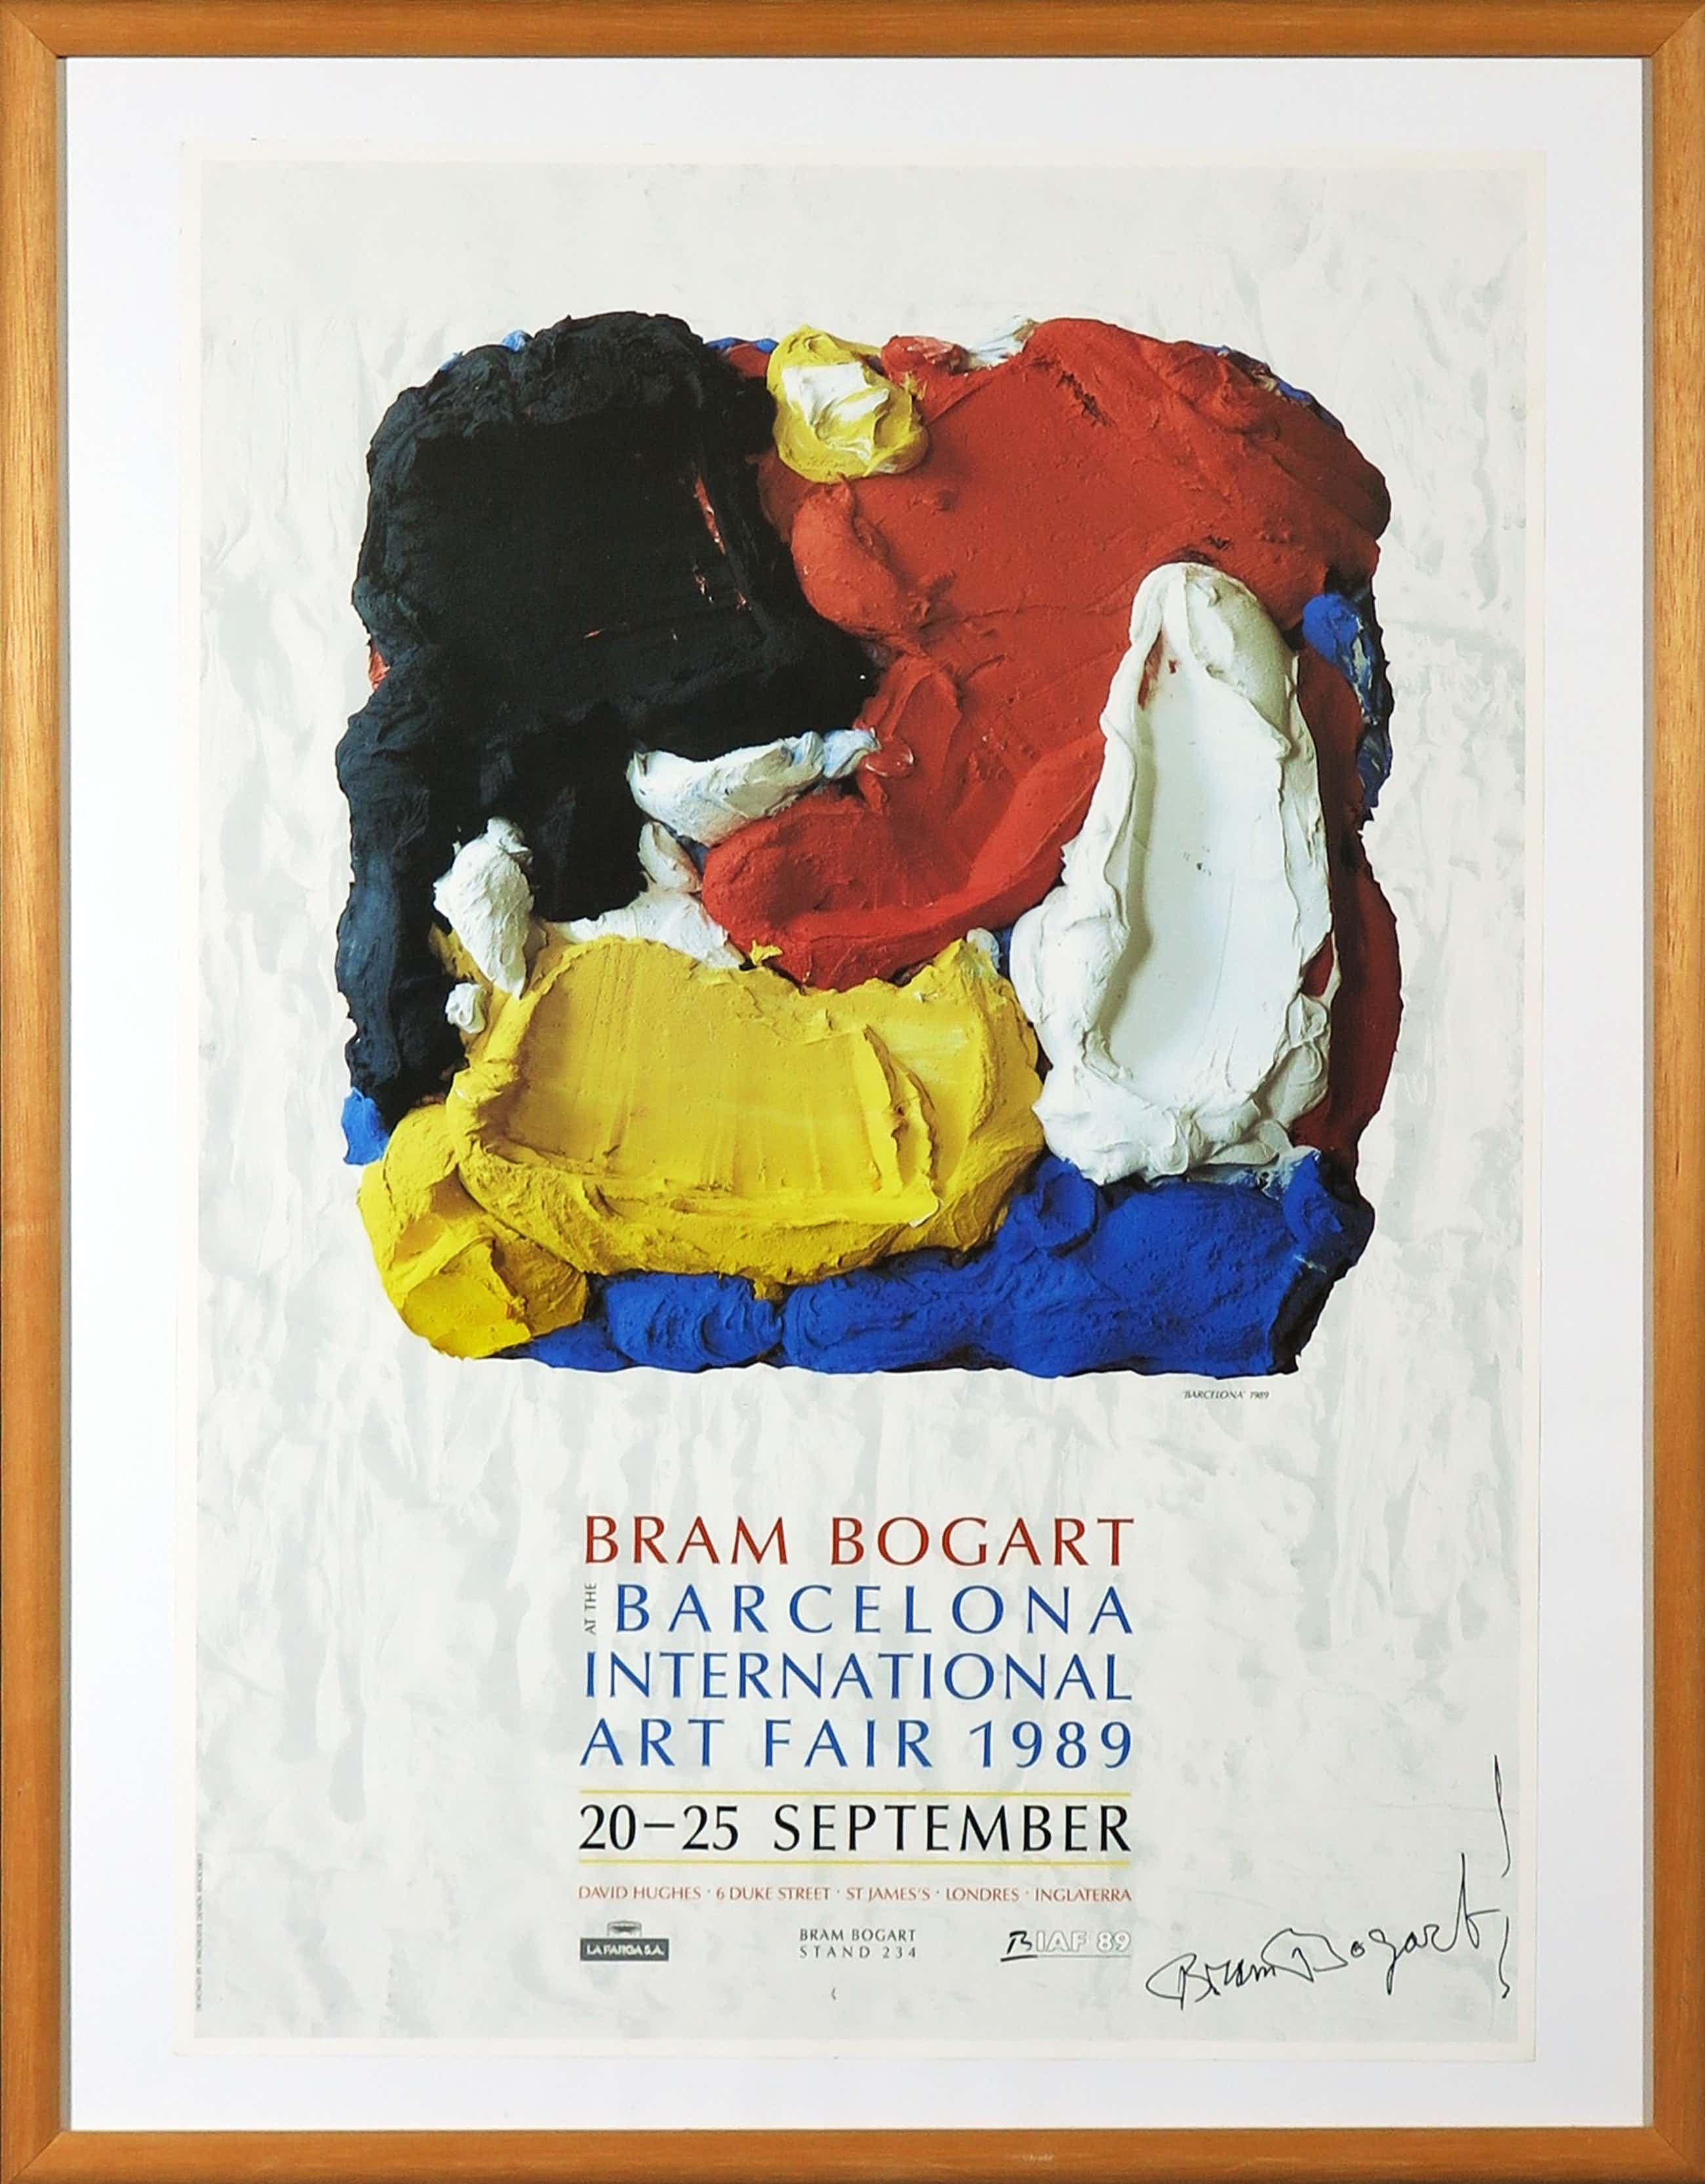 Bram Bogart - Gesigneerd Affiche, Bram Bogart - Barcelona International Art Fair - Ingelijst kopen? Bied vanaf 100!